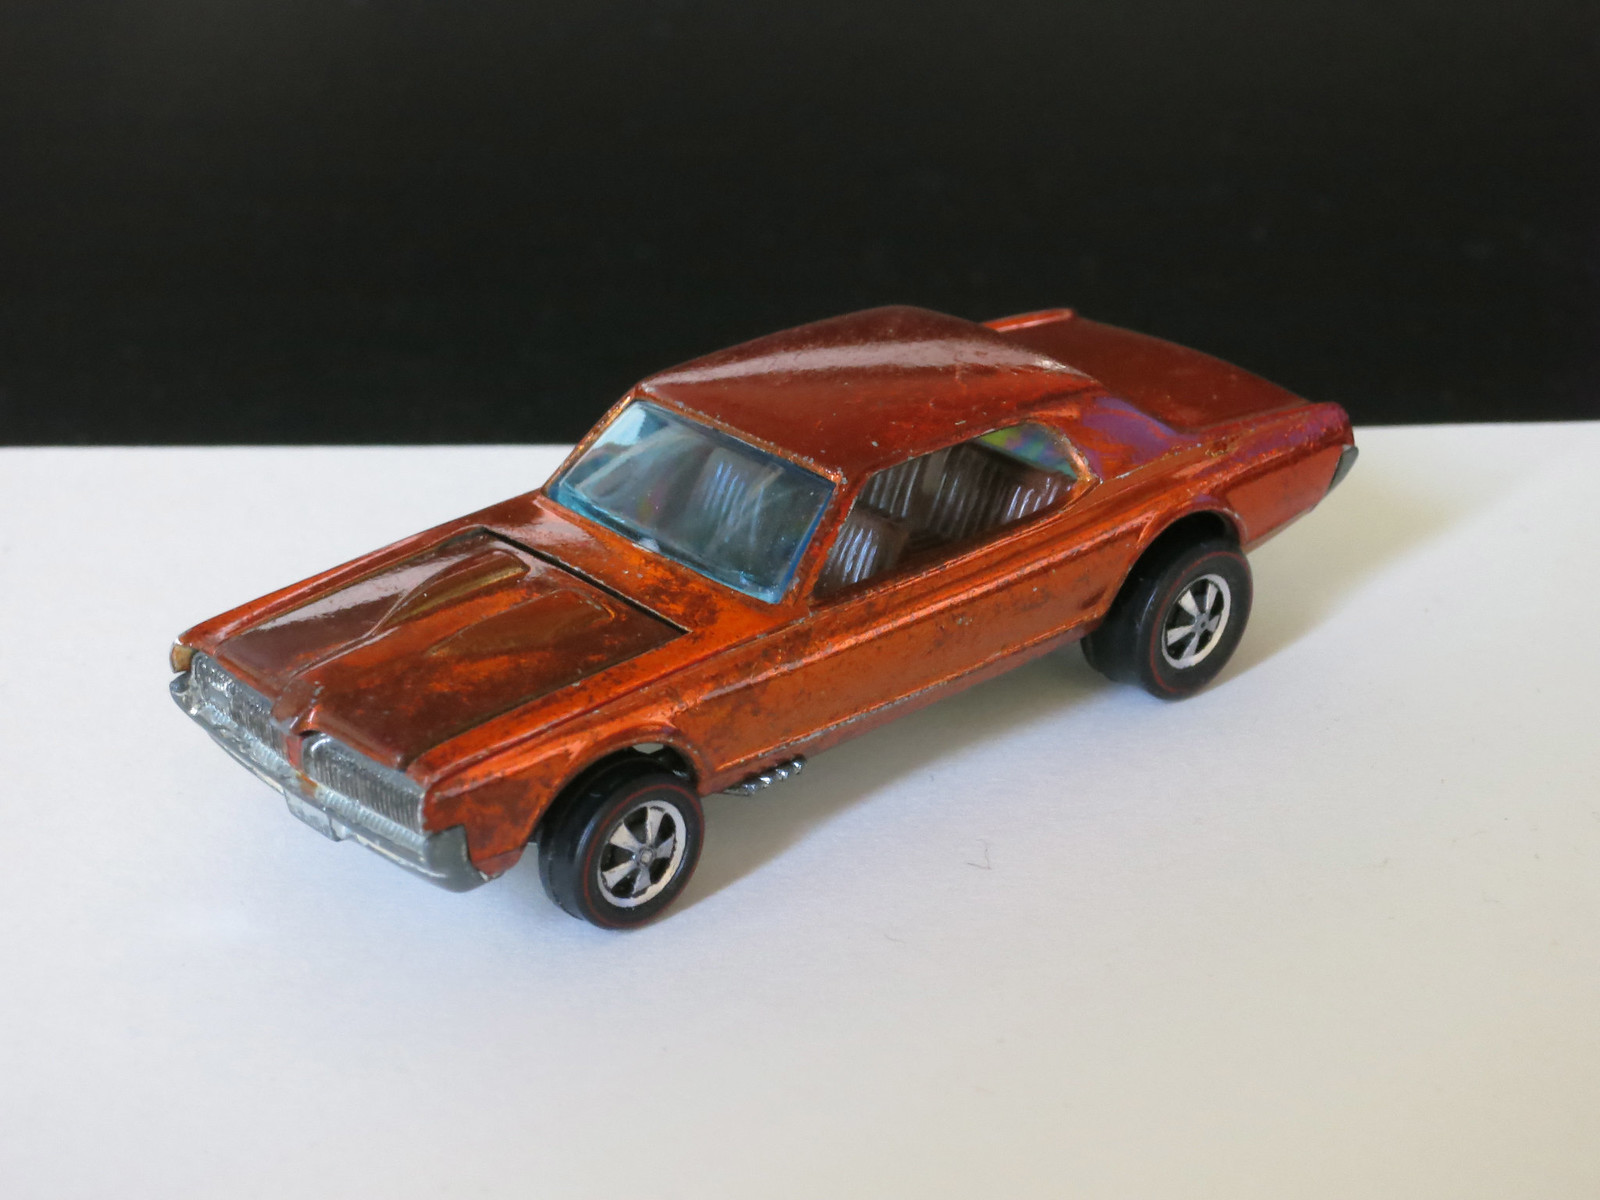 Hot Wheels Redline Orange Custom Cougar HK Early Production